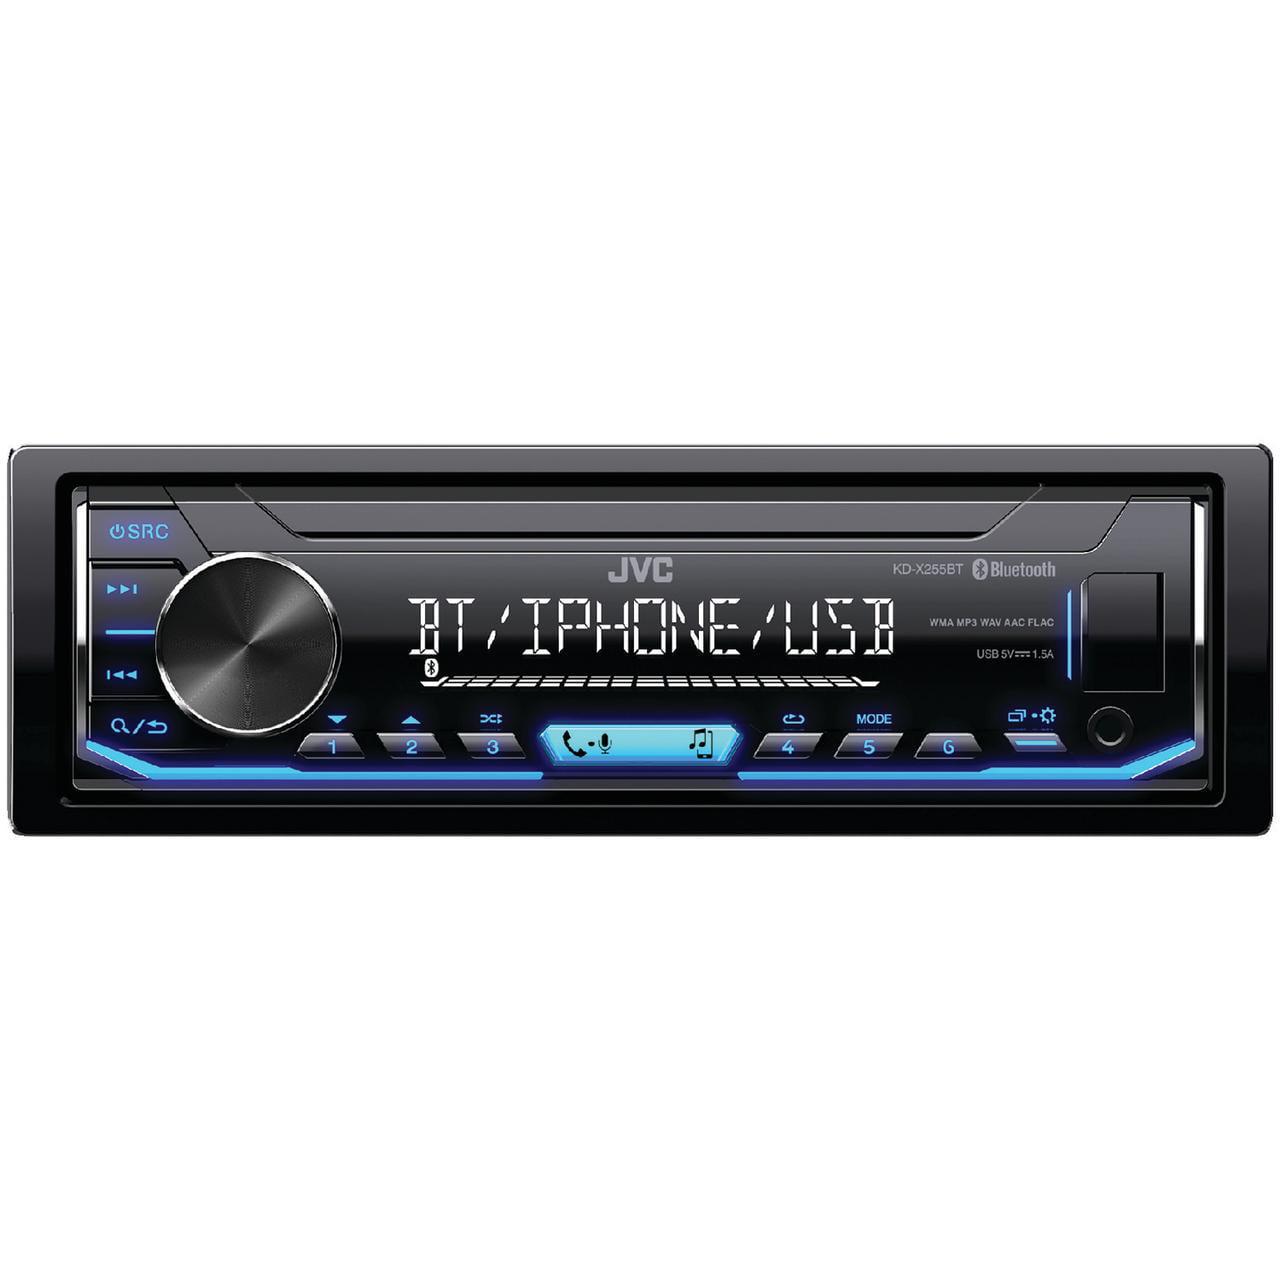 JVC Mobile KD-X255BT Single-DIN In-Dash AM FM Digital Media Player with Bluetooth by JVC